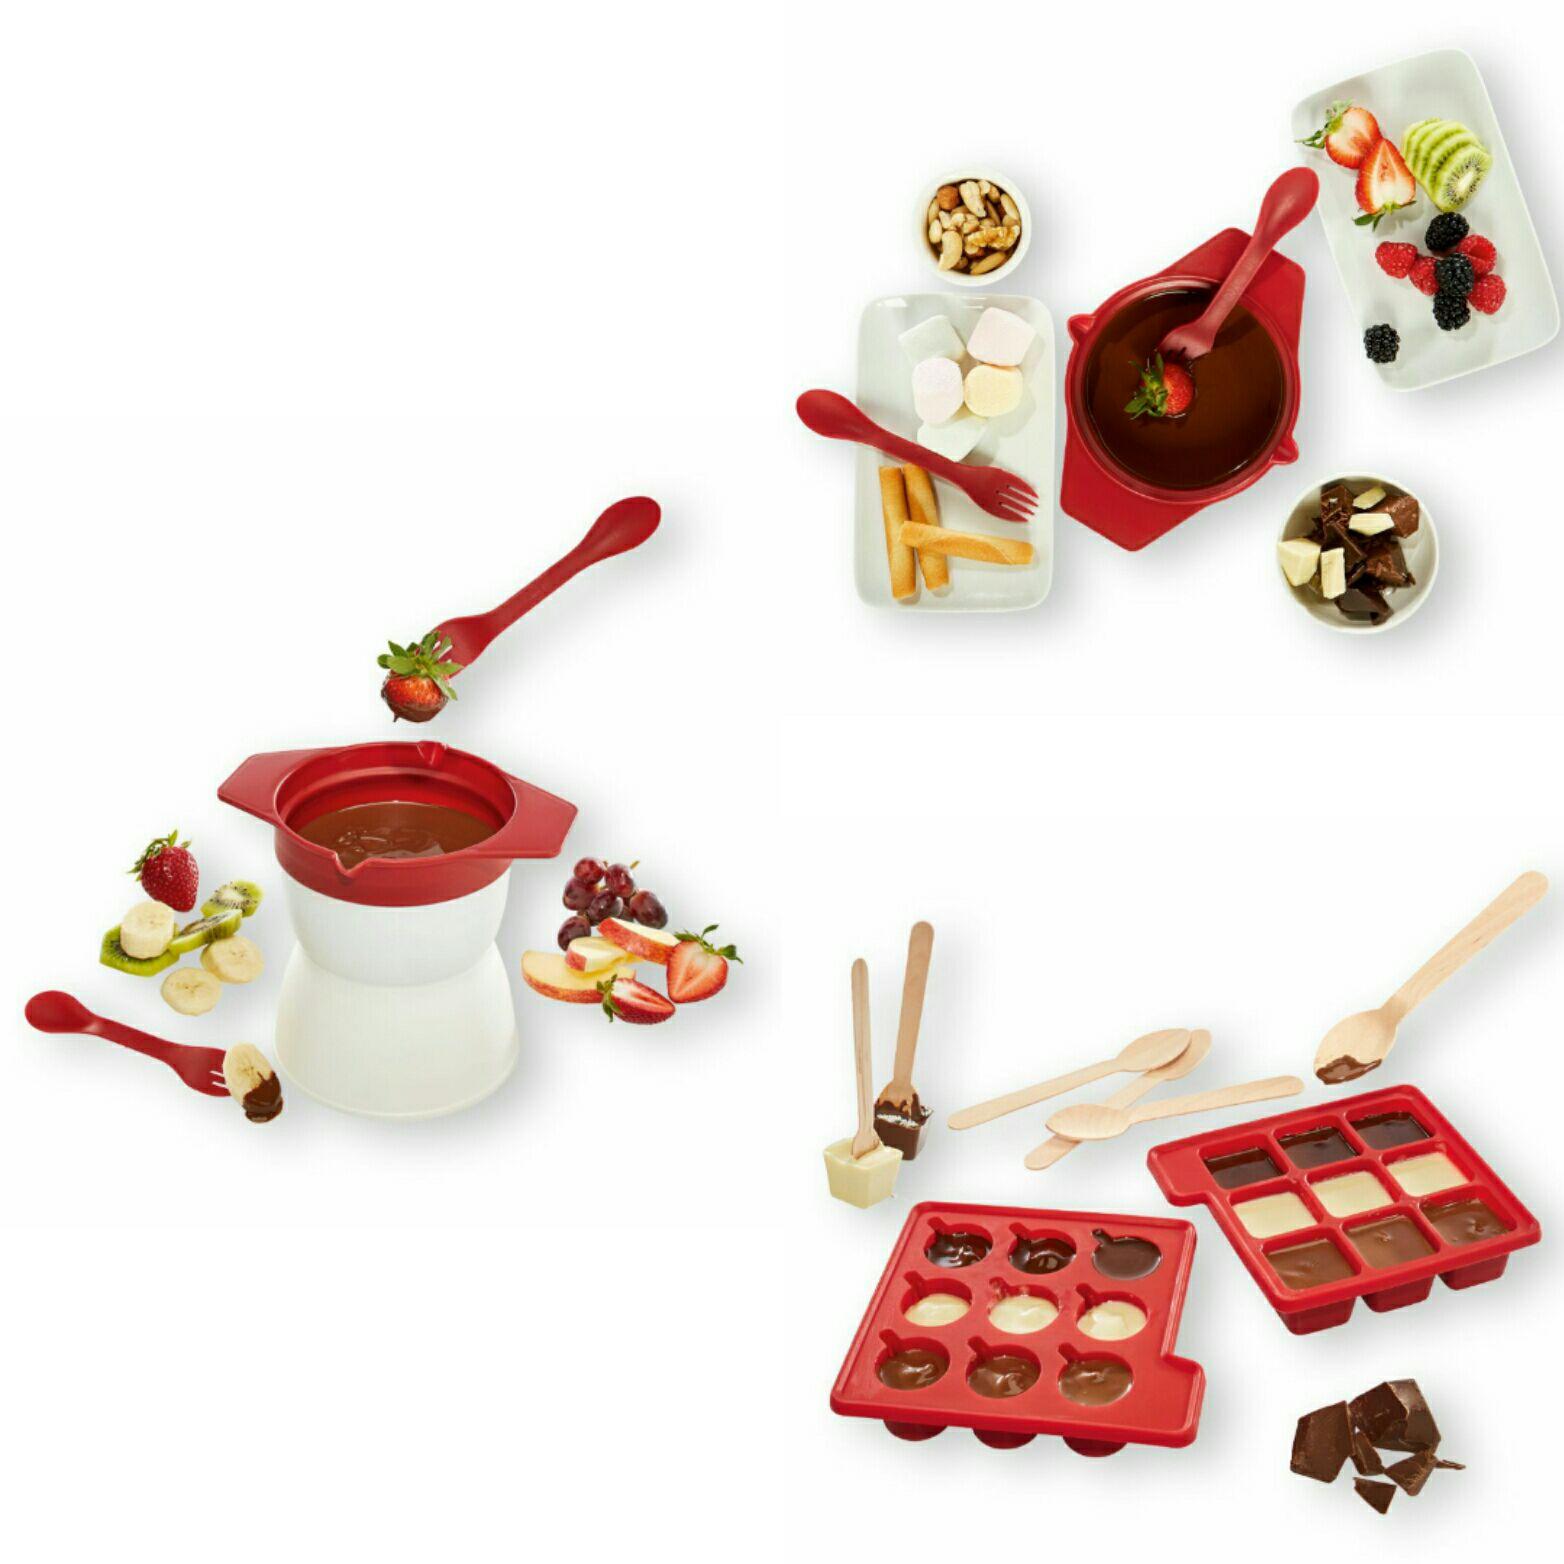 Moldes de silicona para bombones | Set de fondue de chocolate 400 ml